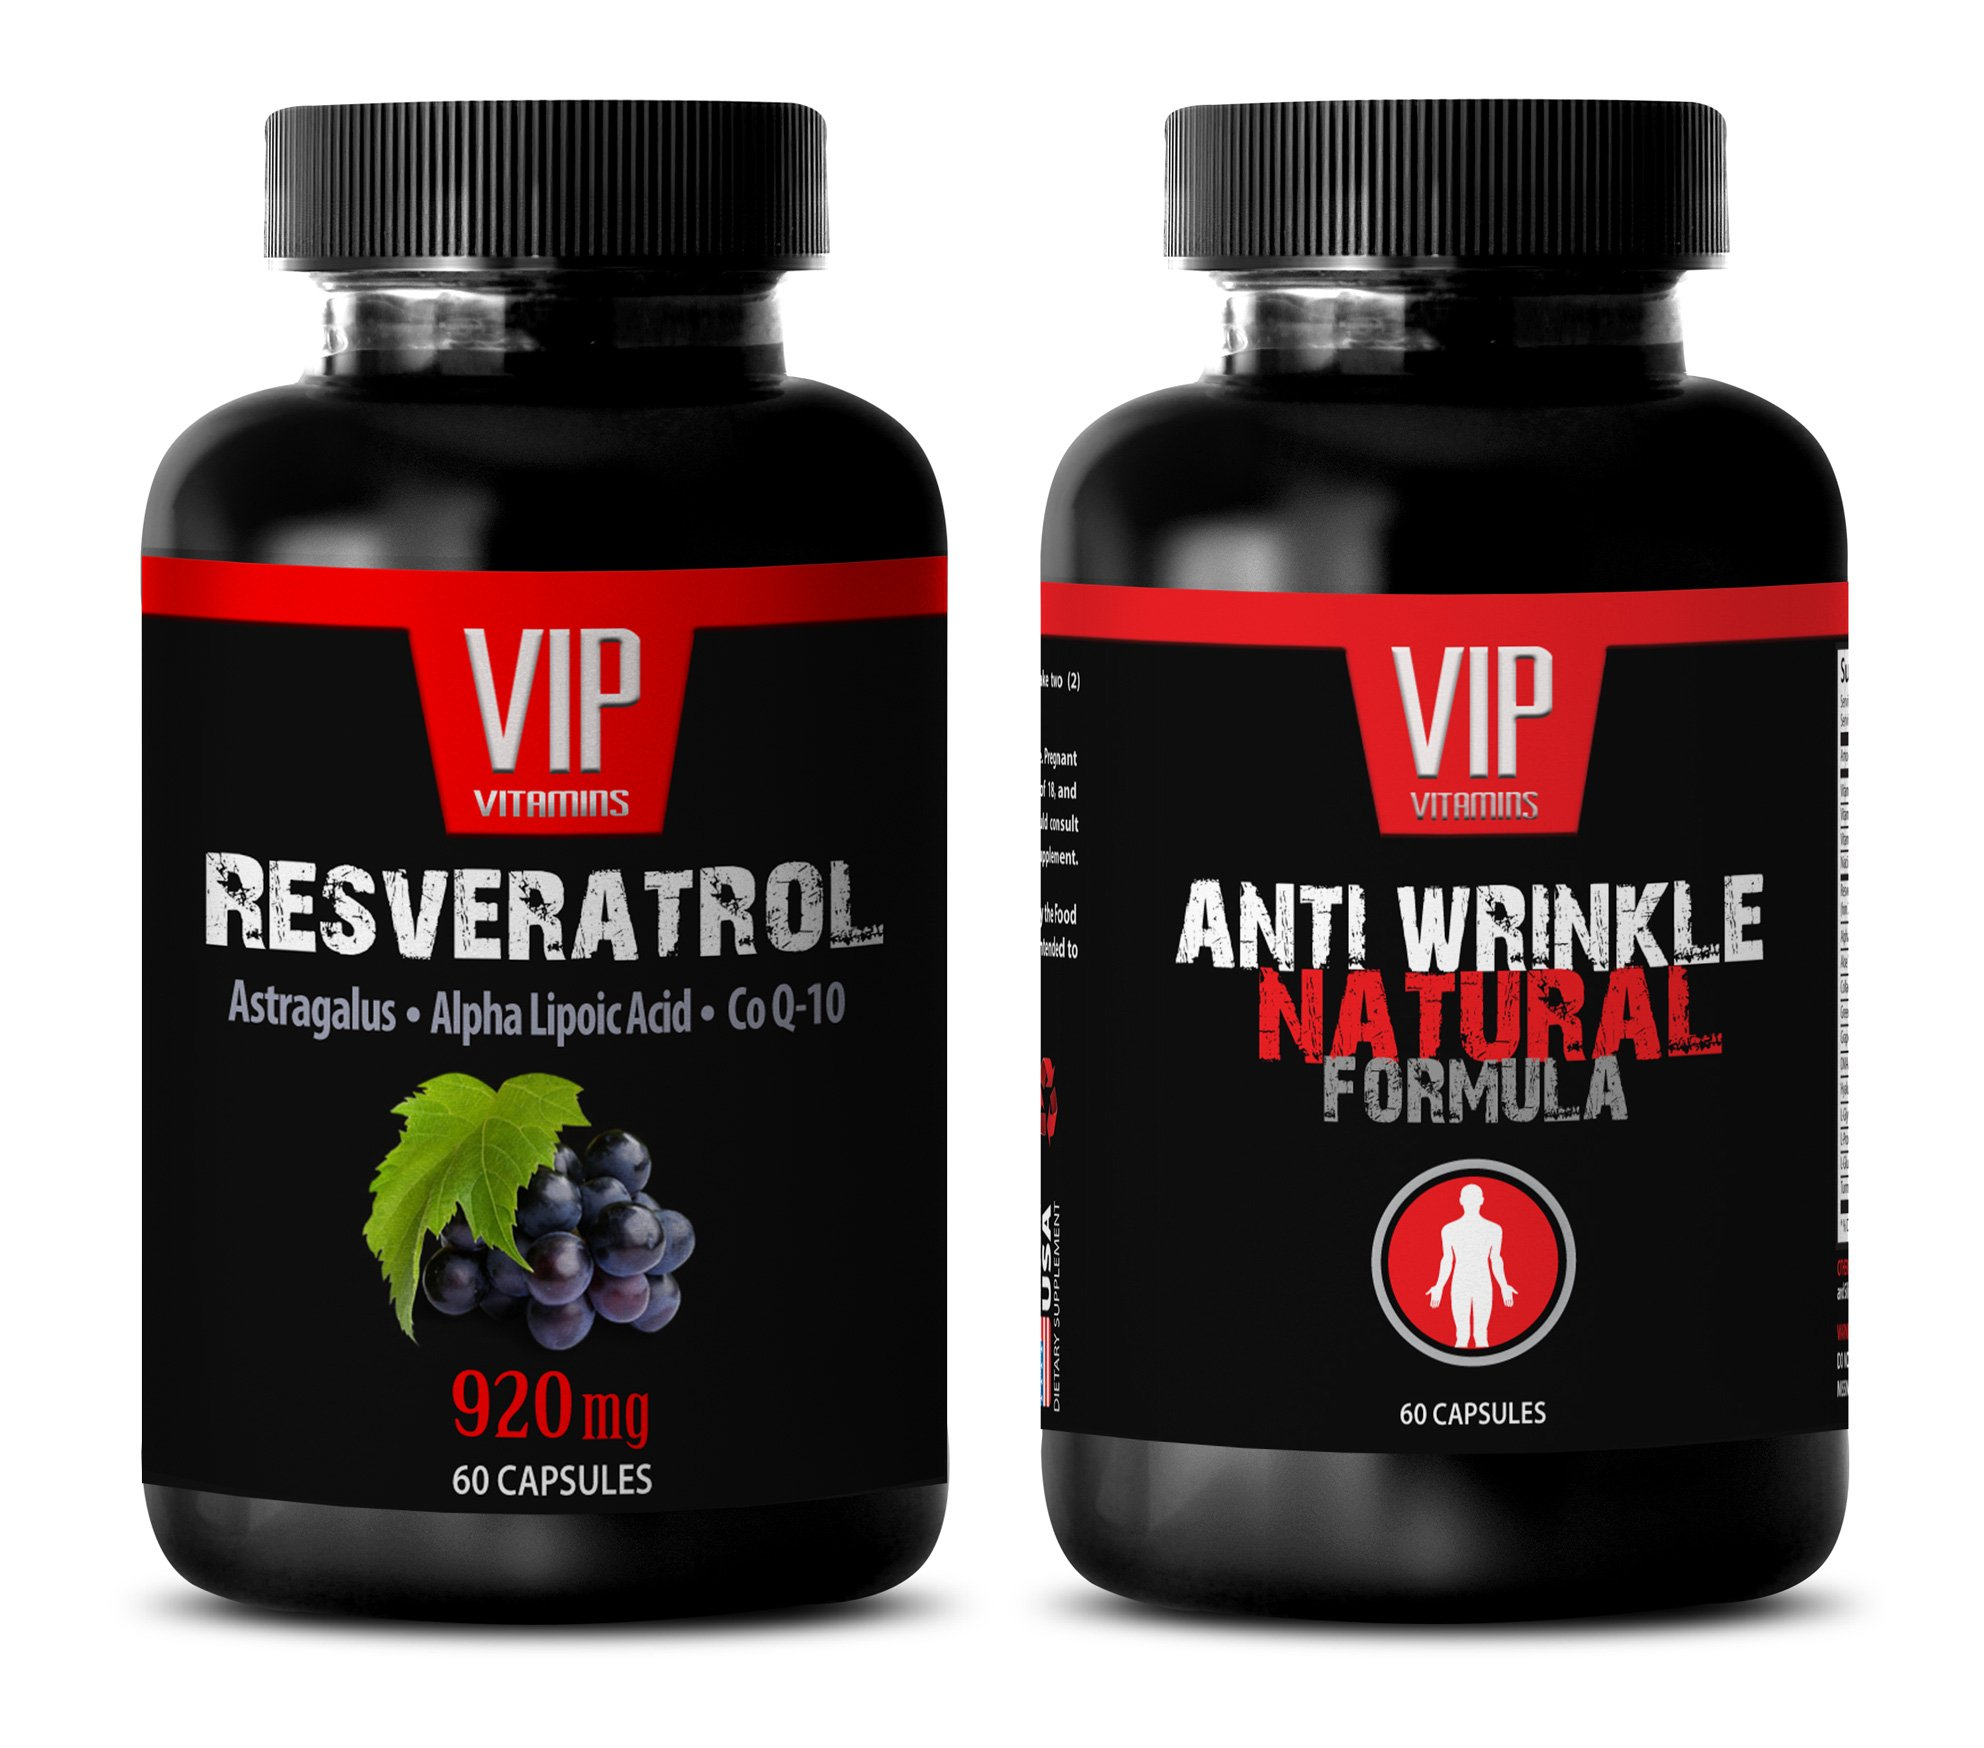 energy vitamin supplement - RESVERATROL – ANTI WRINKLE - COMBO - grape seed oil extract - 2 Bottles - (60+60 Capsules)